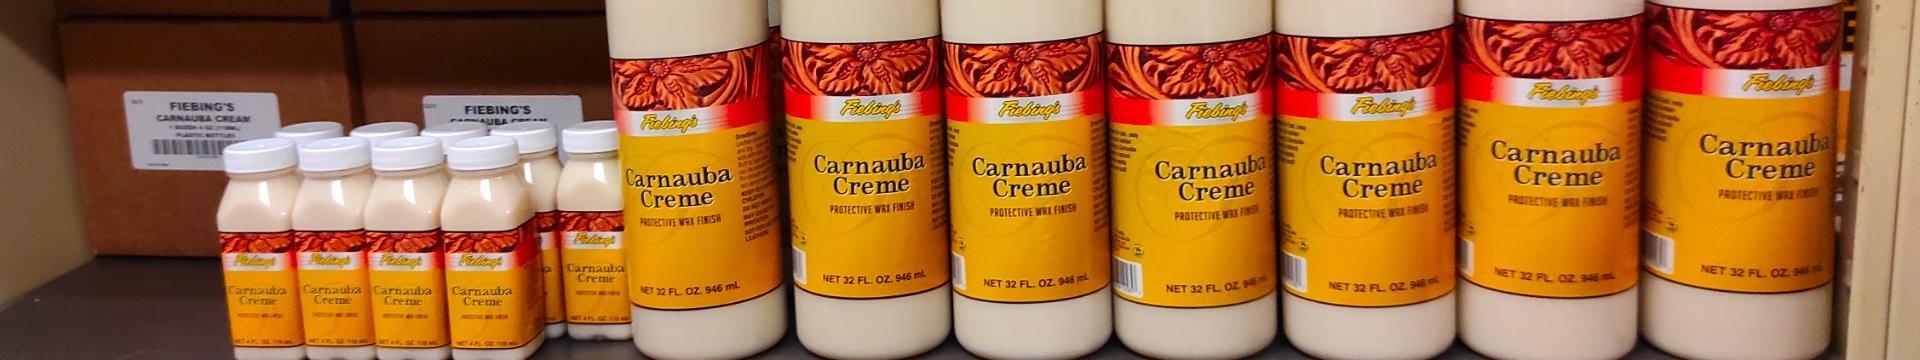 Carnauba Cream